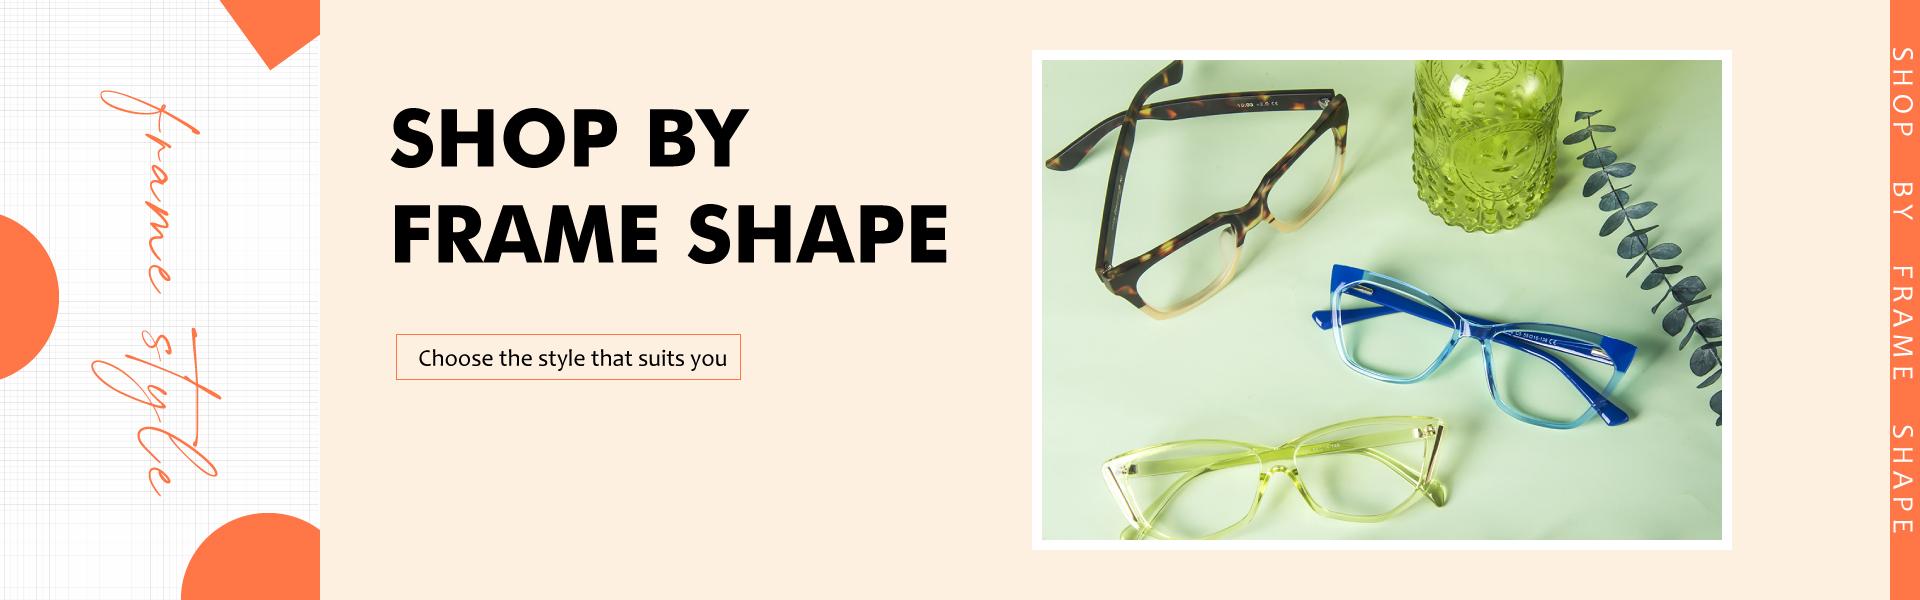 shop by frame shape